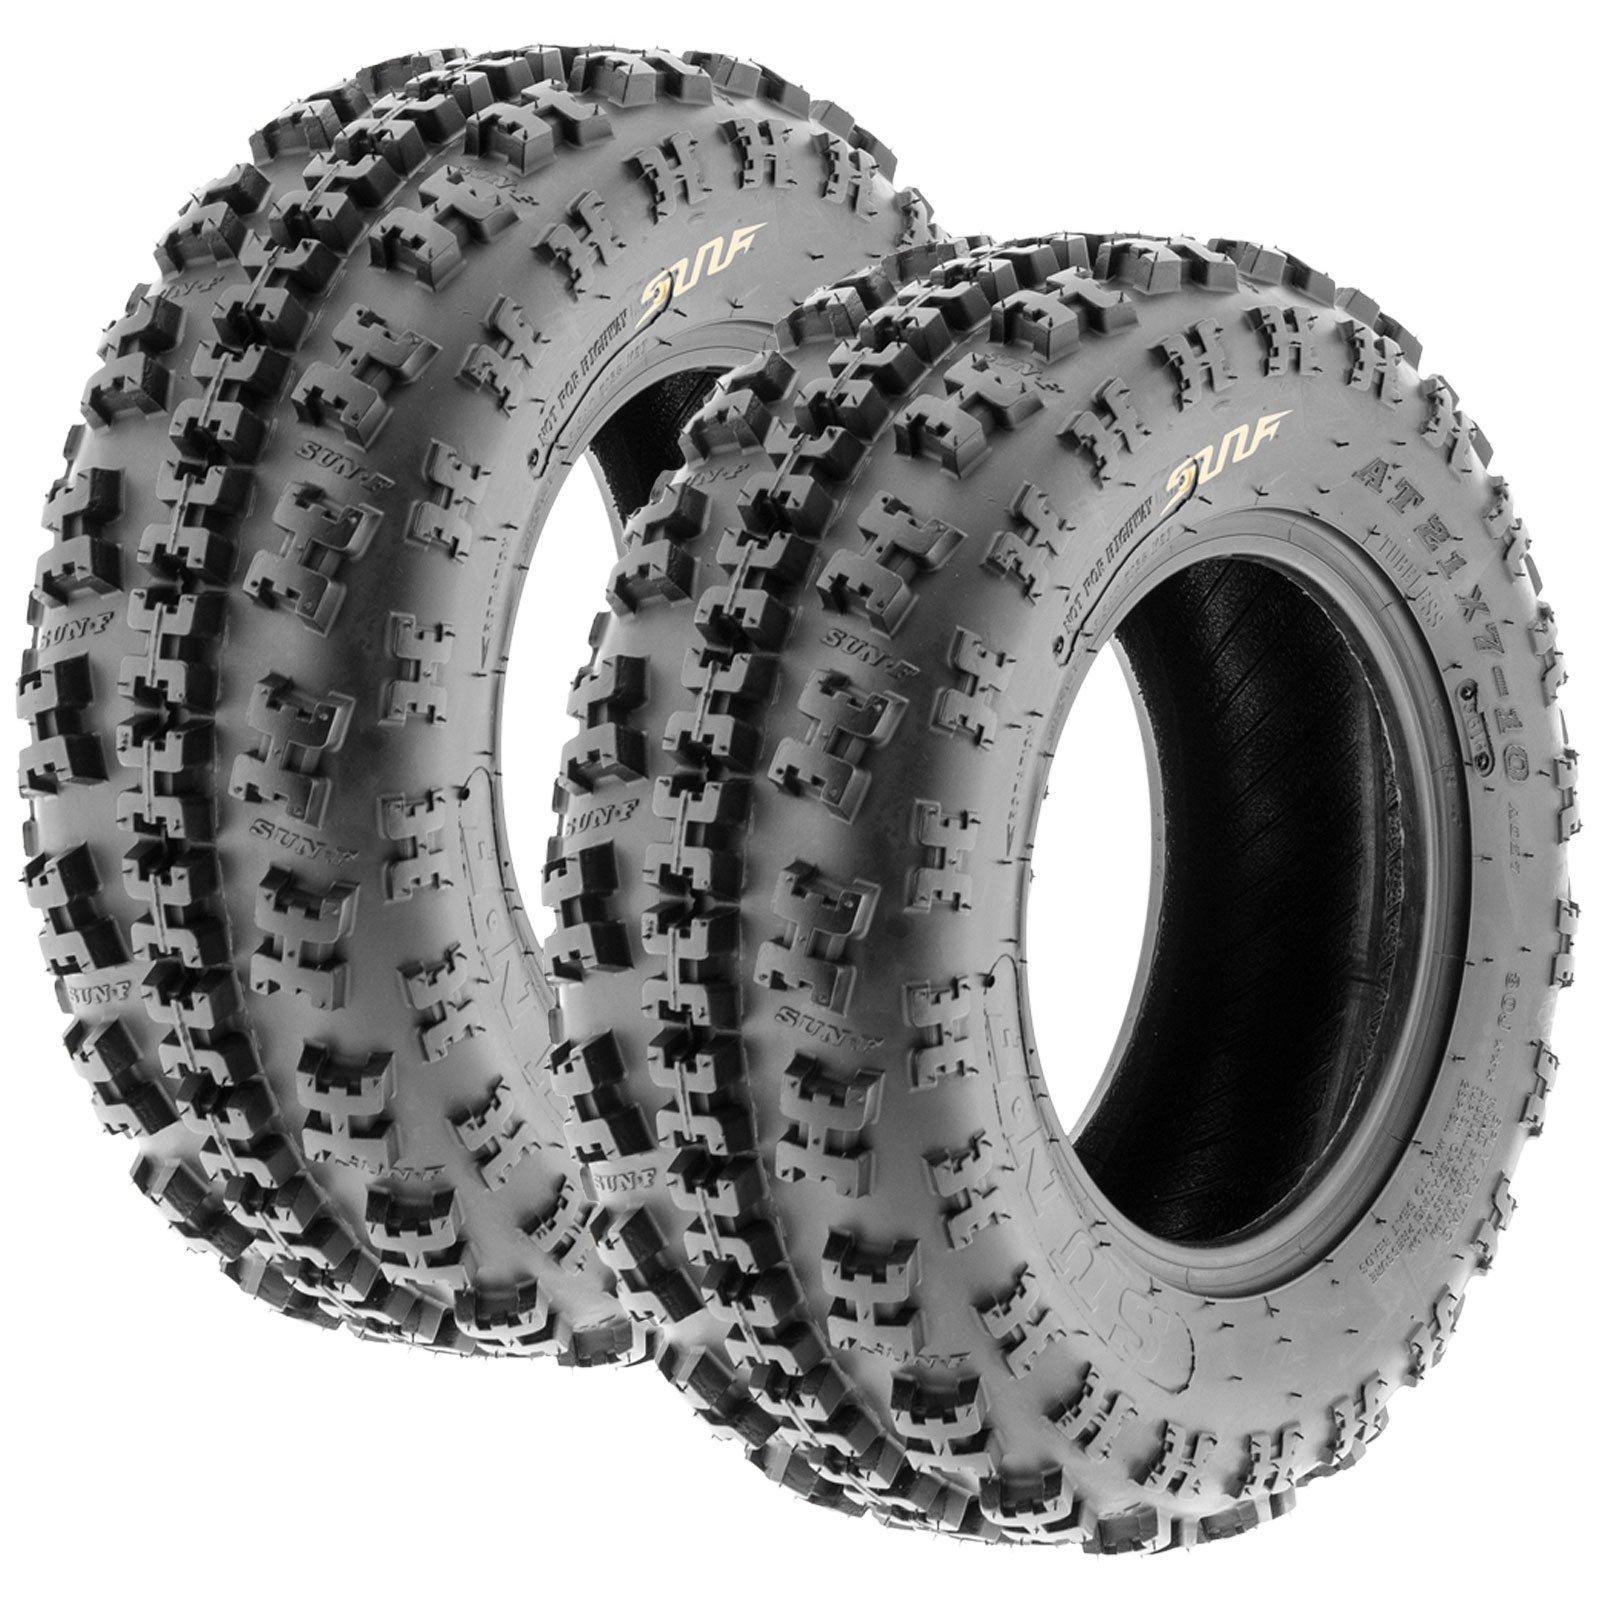 Set of 2 SunF A027 XC ATV UTV Knobby Sport Tires 23x7-10, 6 PR, Tubeless